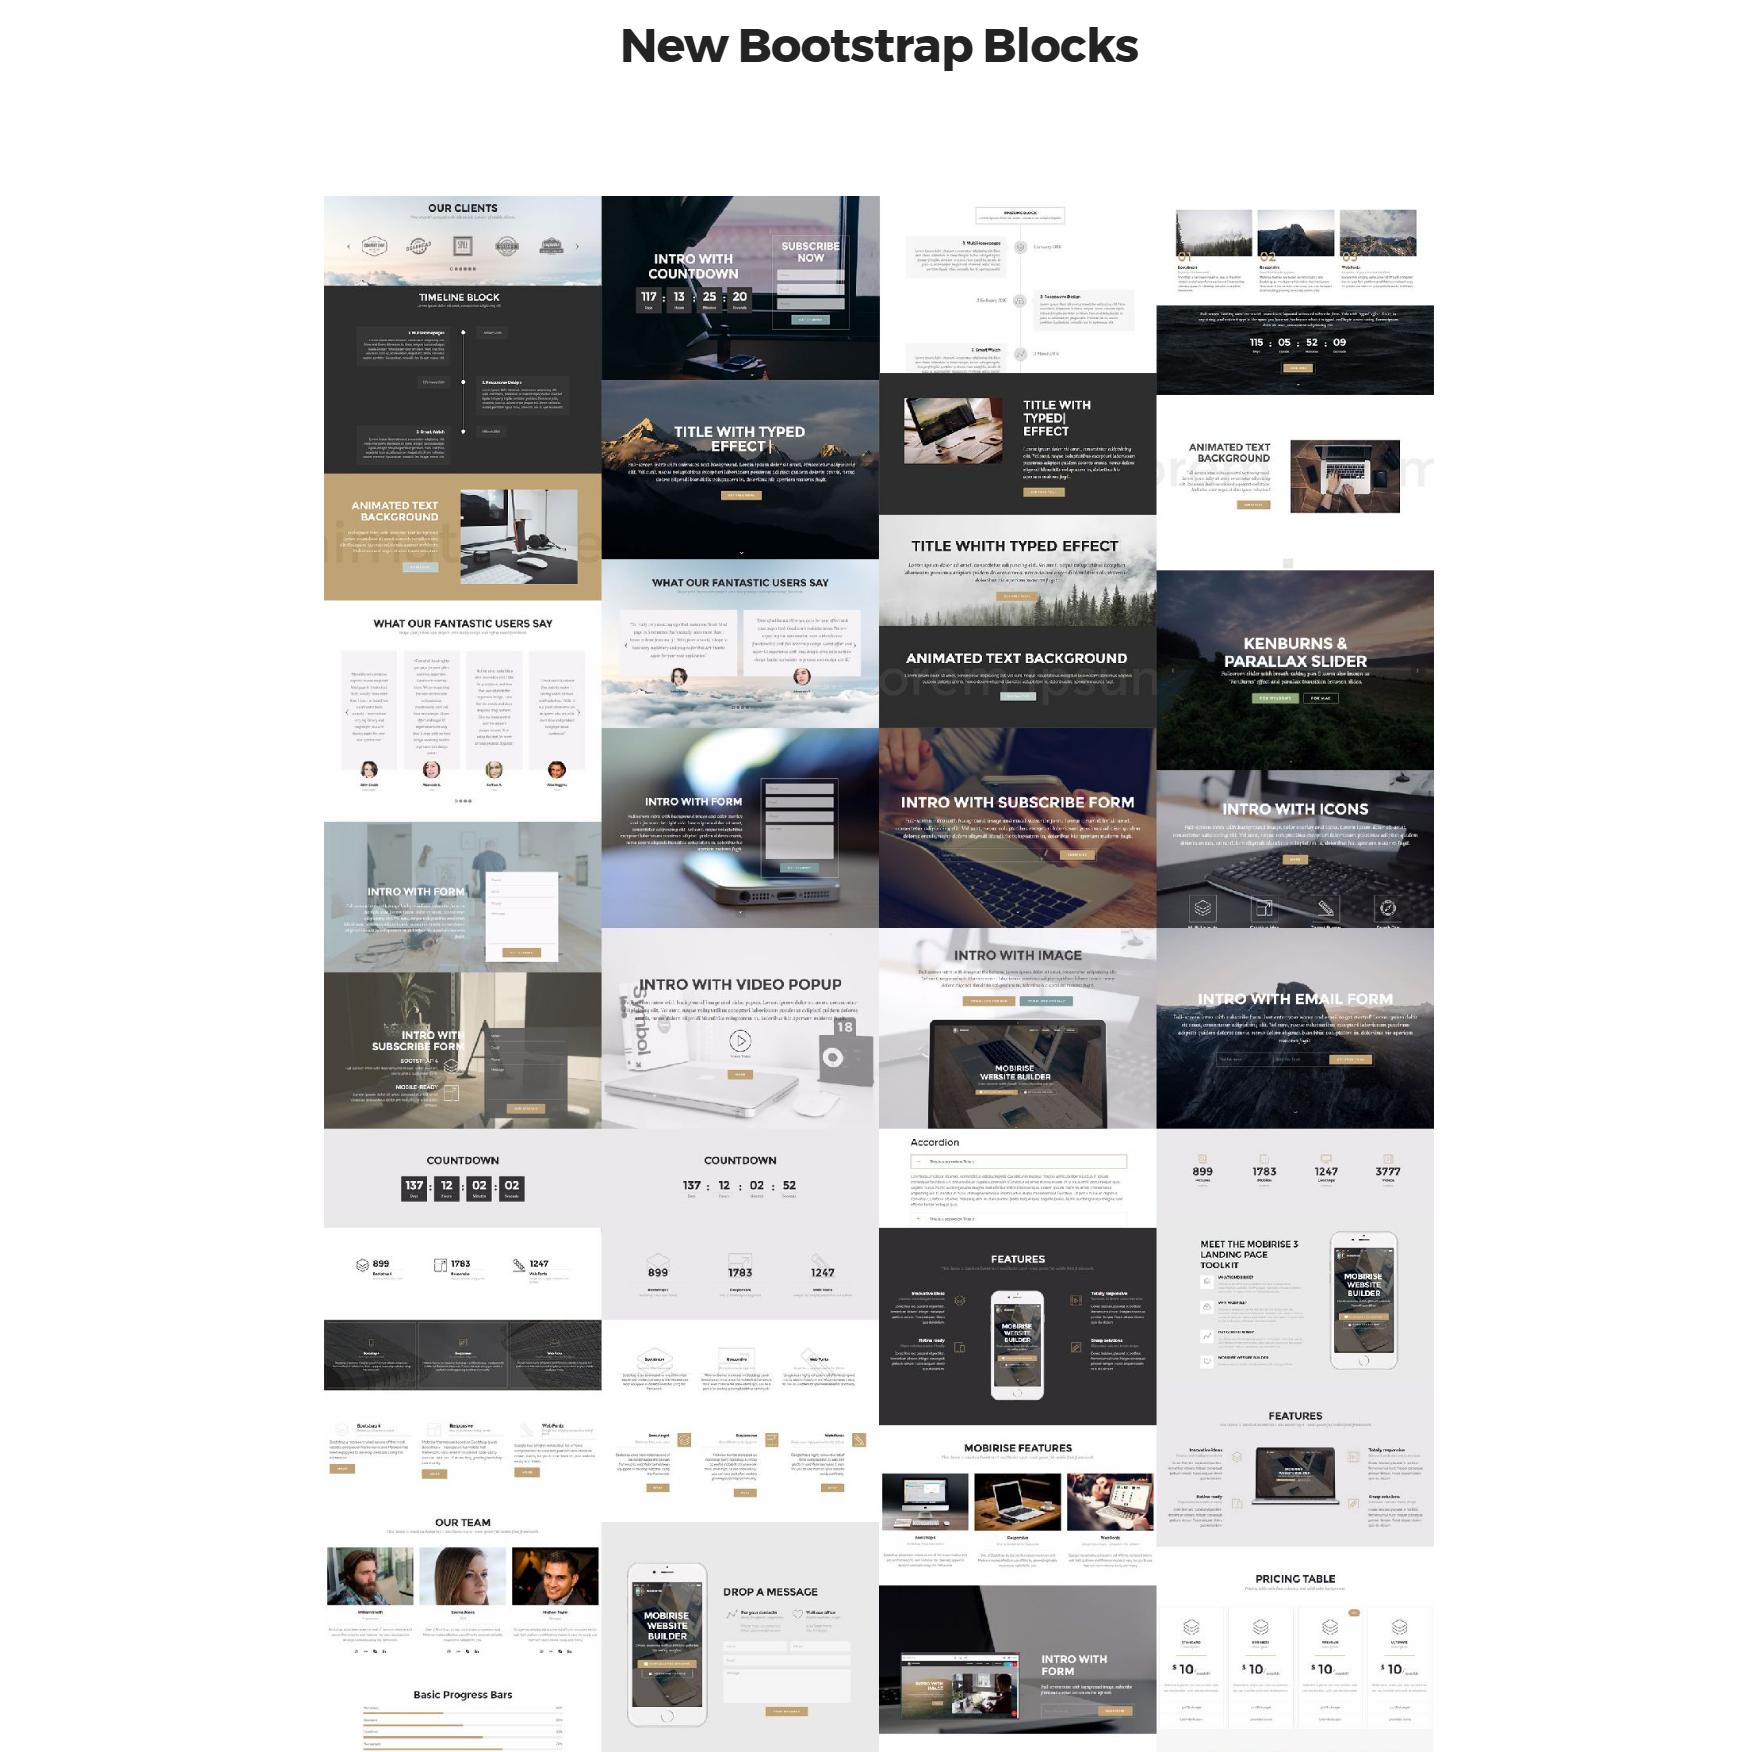 HTML5 Bootstrap 4 mobile-friendly blocks Templates